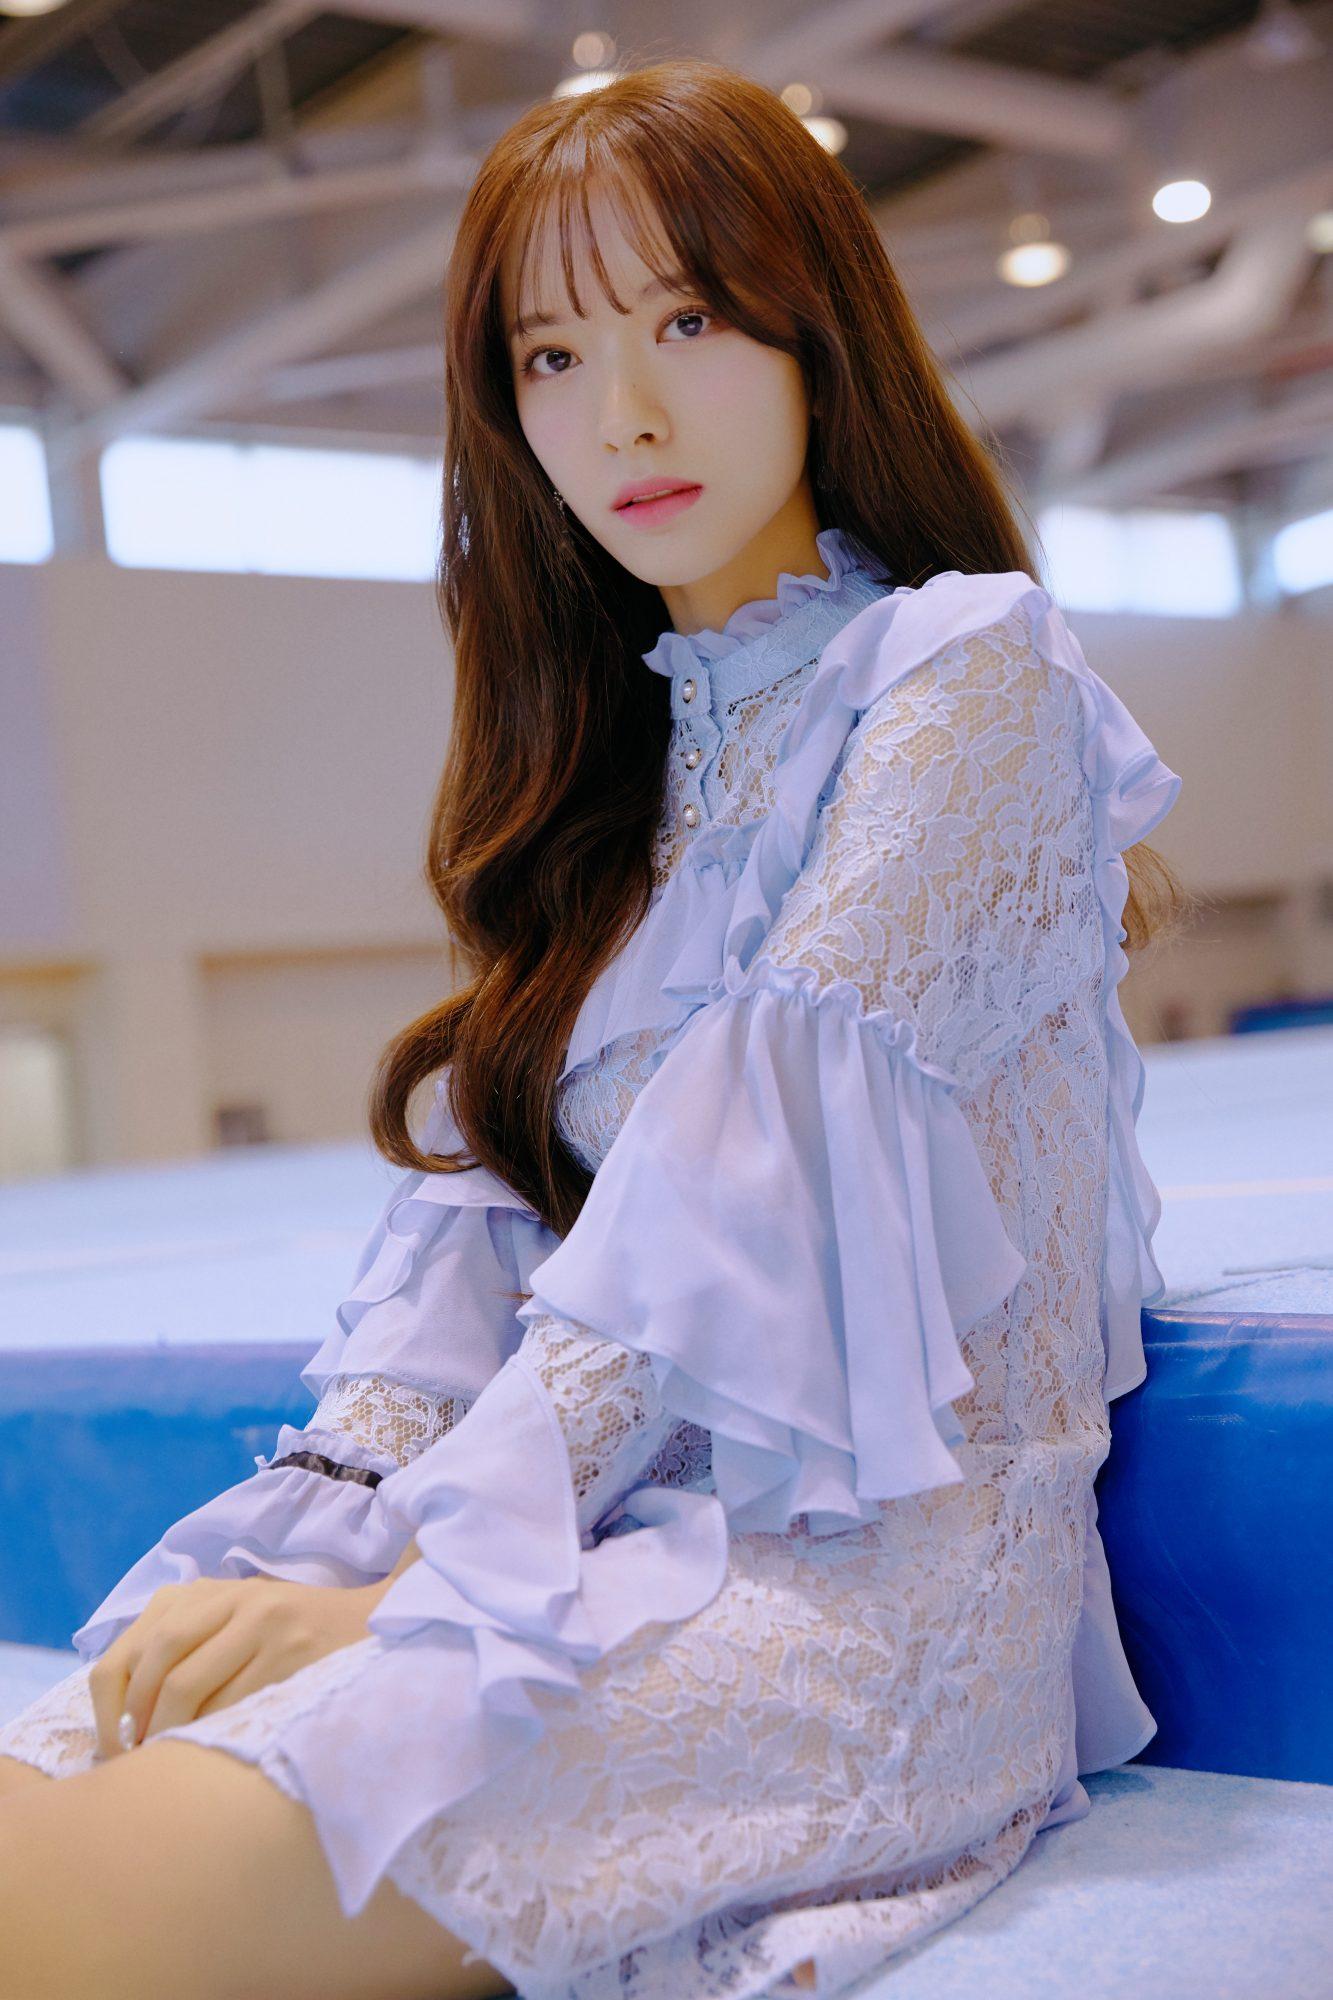 Foreign Girls Wallpaper Wjsn Wj Stay Concept Photos Hd Hr K Pop Database